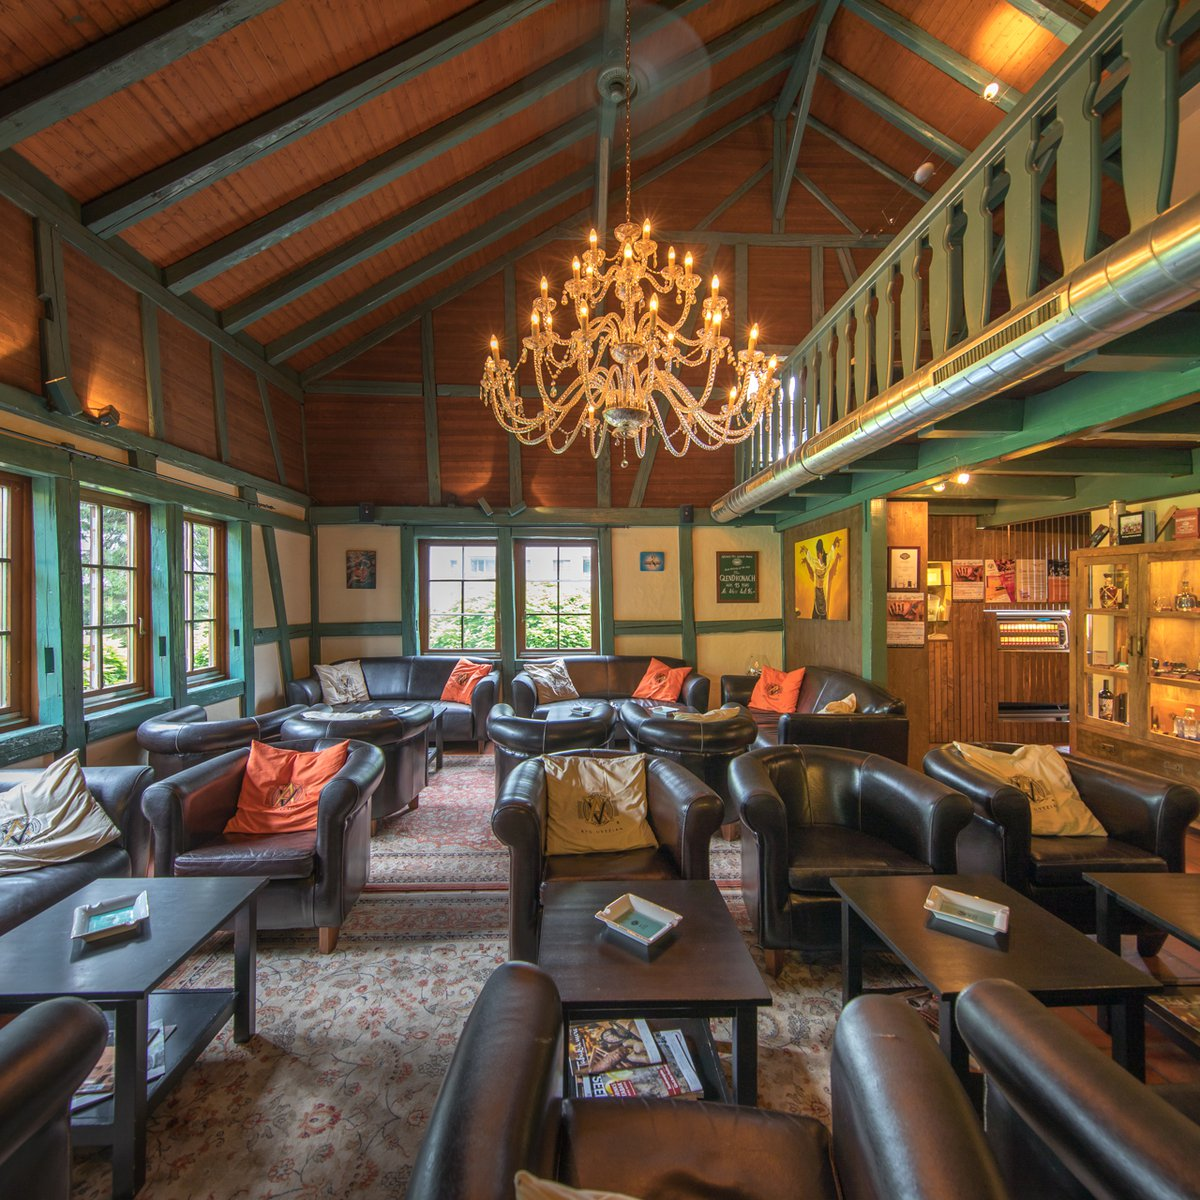 Casa Colonial Bar & Avo AVO Lounge